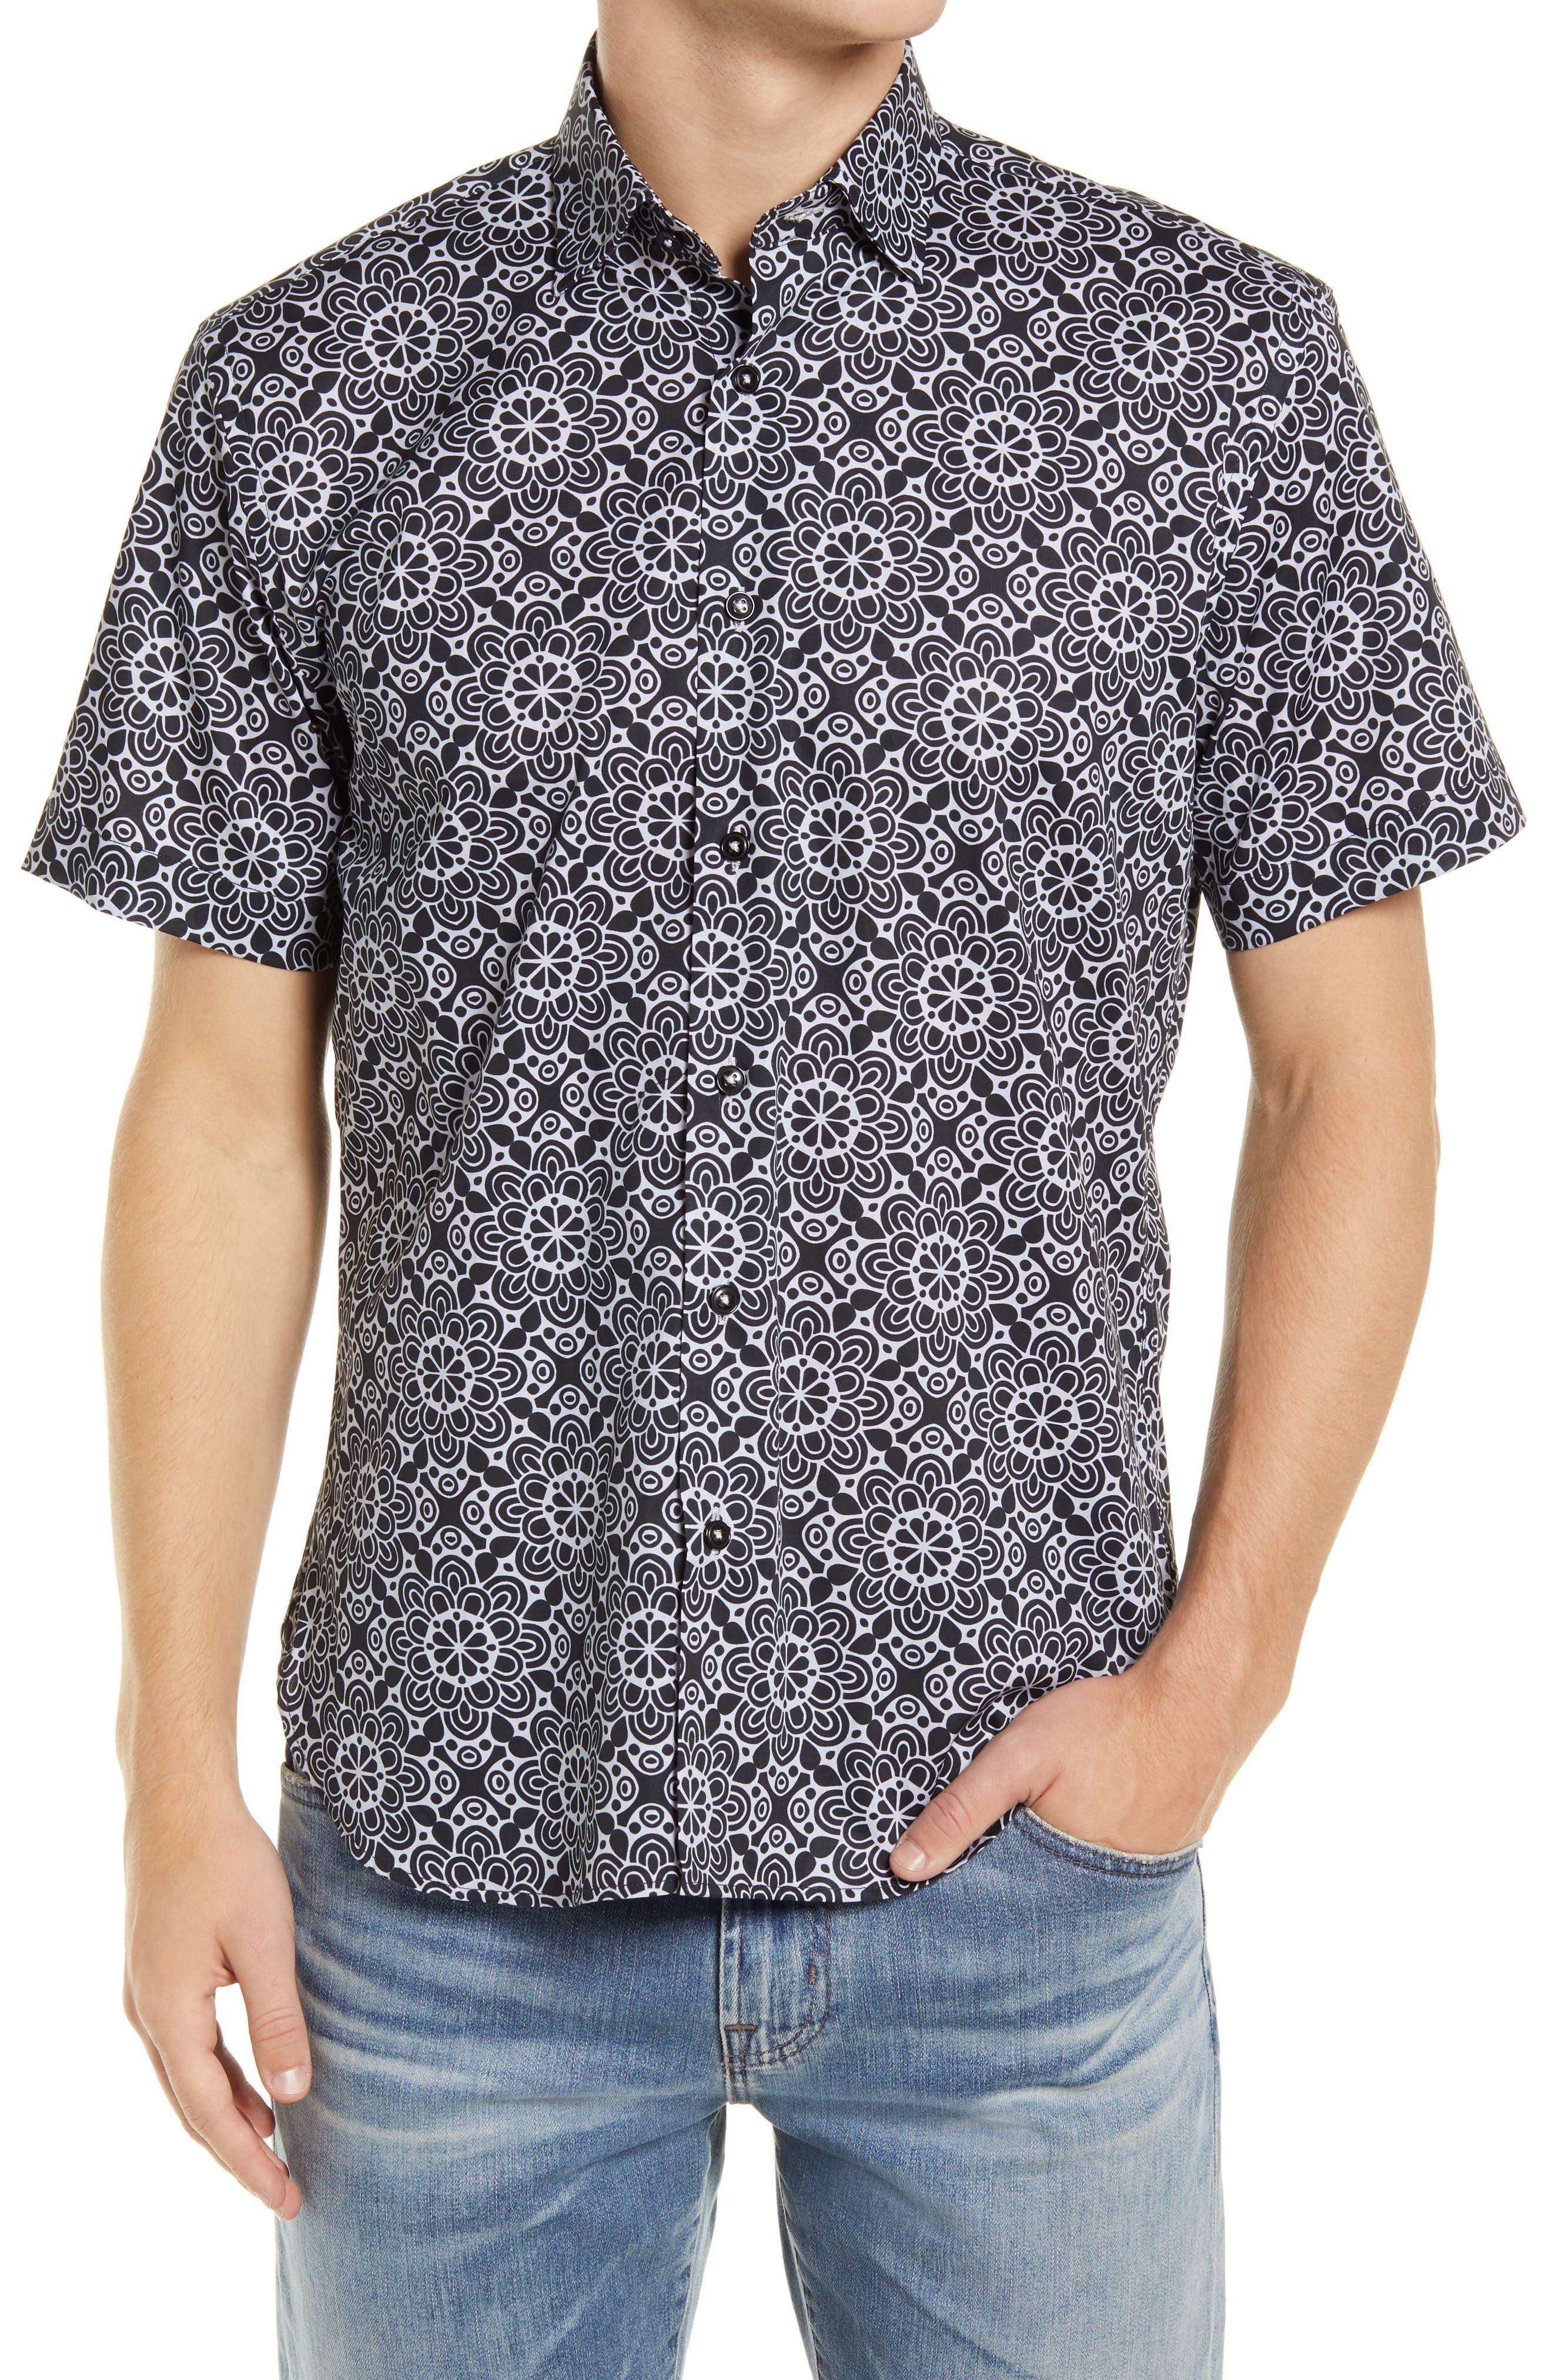 Wallpaper Floral Medallion Short Sleeve Stretch Button-Up Shirt